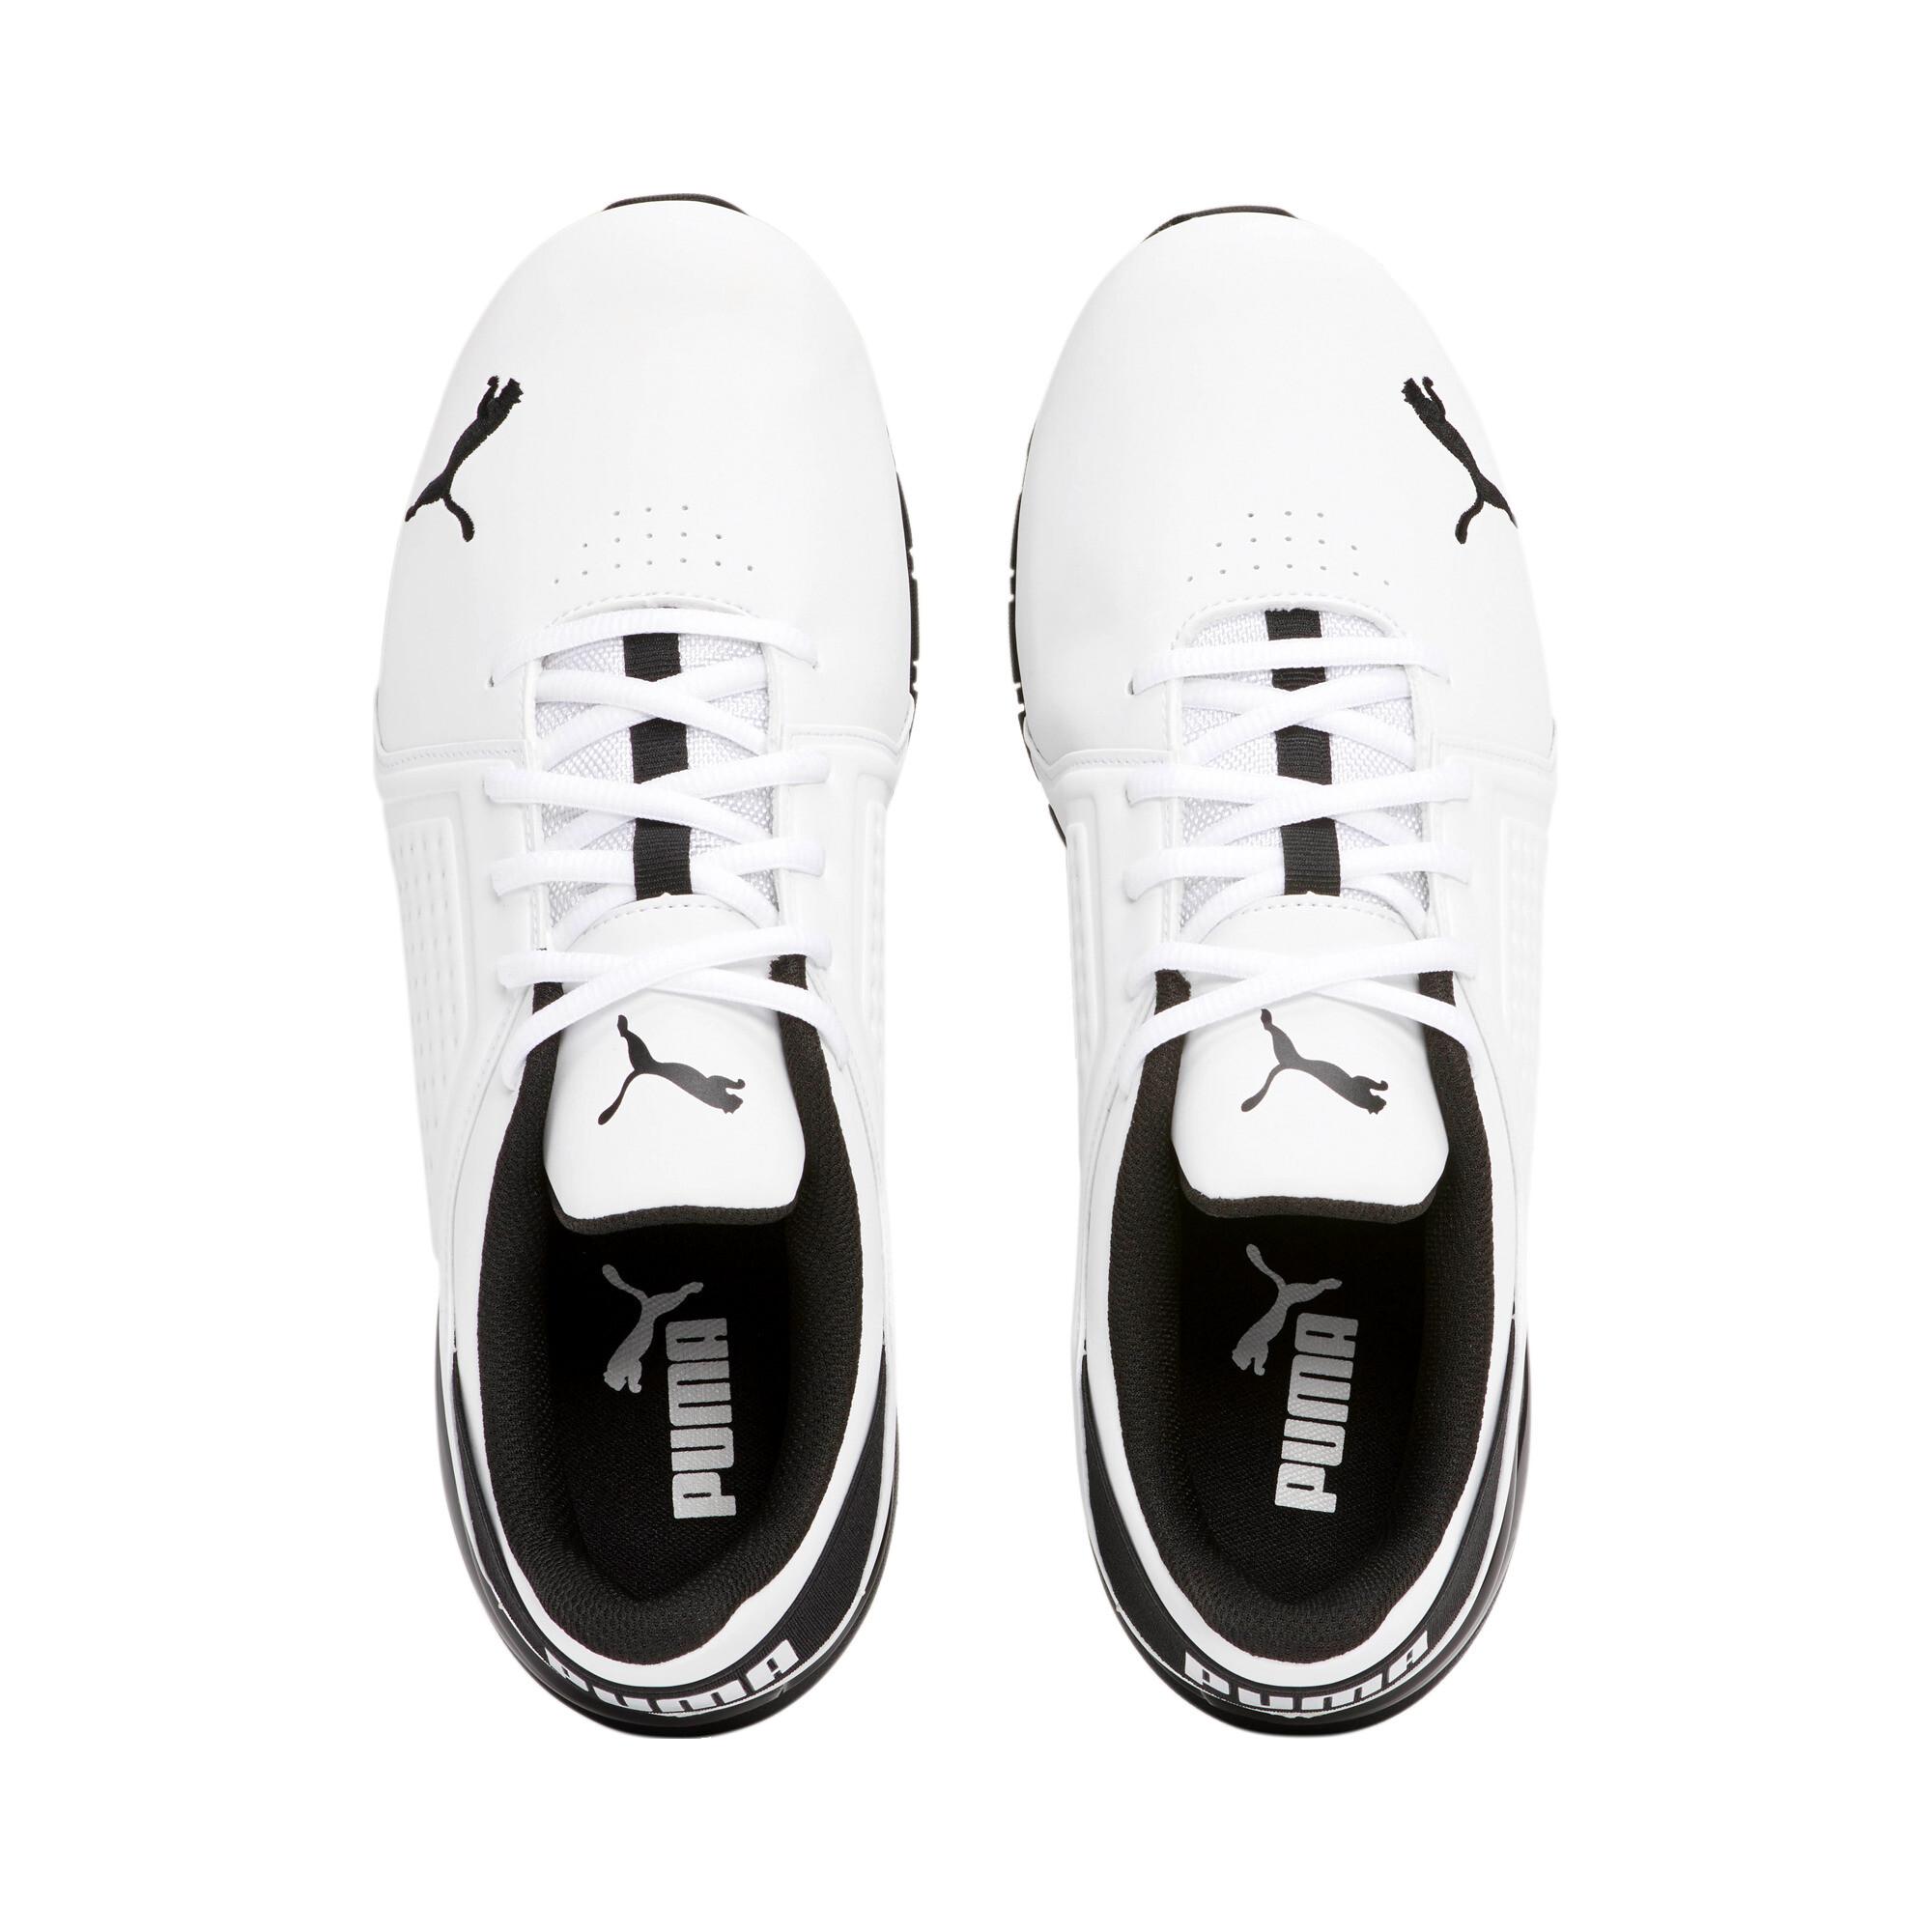 PUMA-Men-039-s-Viz-Runner-Wide-Shoes thumbnail 7